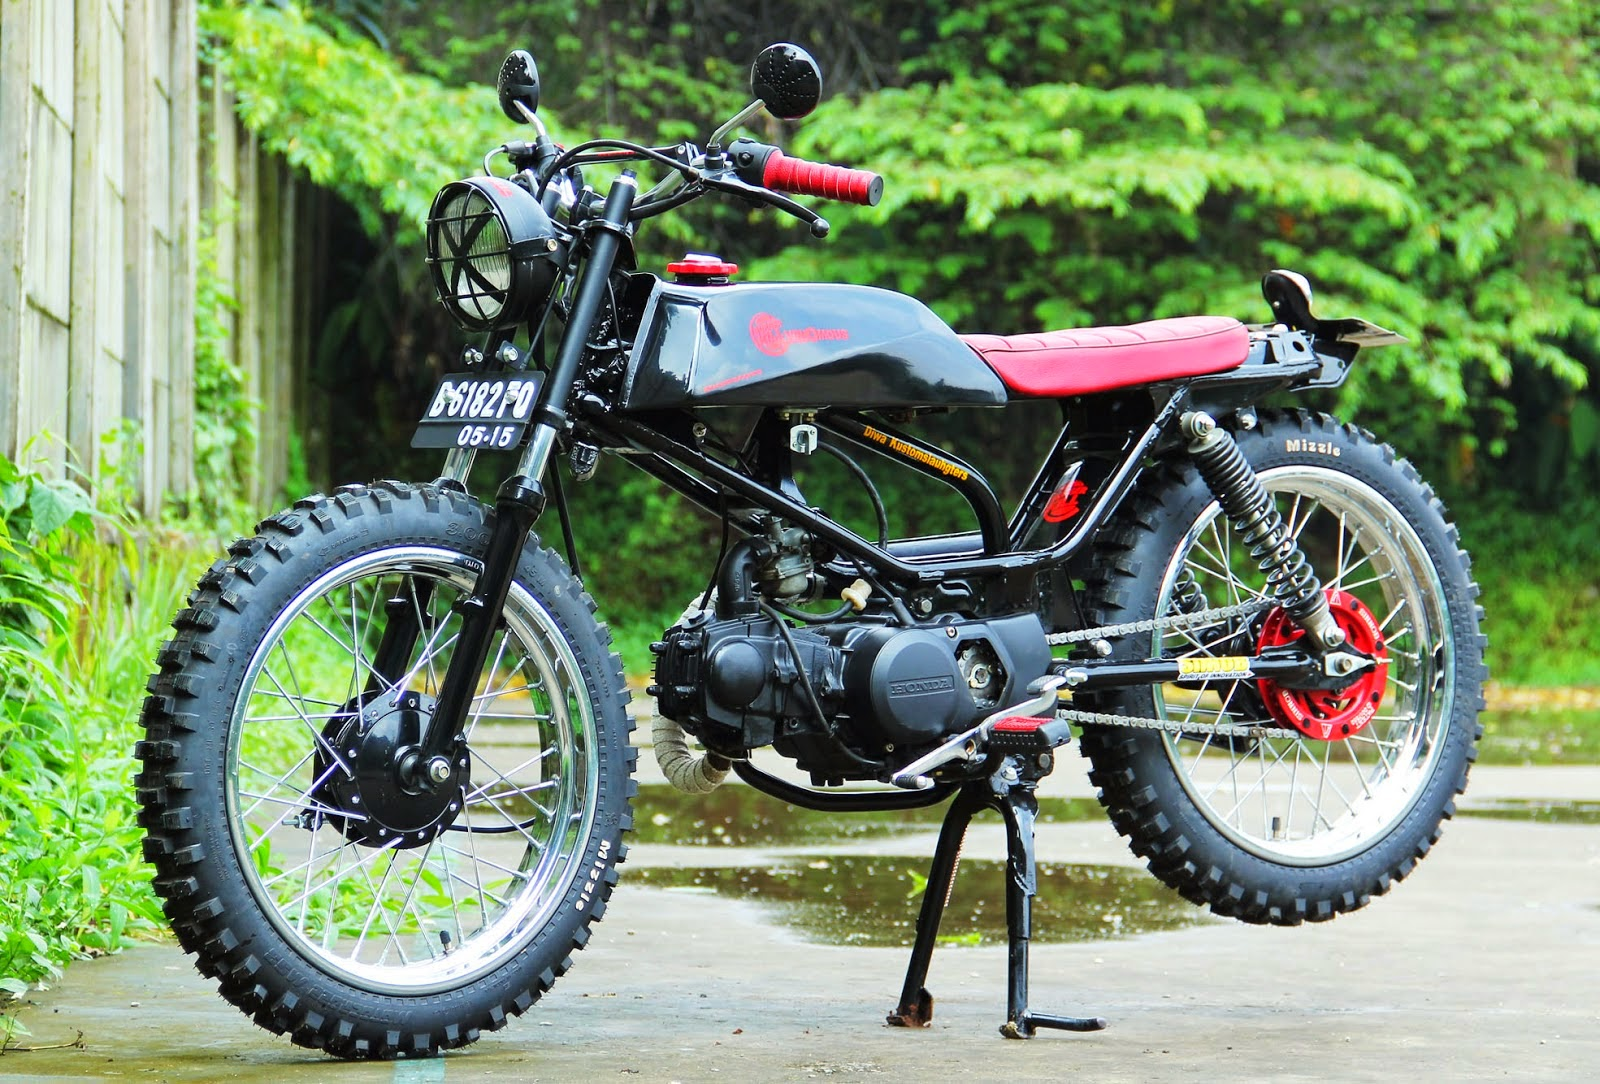 Koleksi Gambar Sepeda Motor Yamaha Jadul Terlengkap Codot Modifikasi